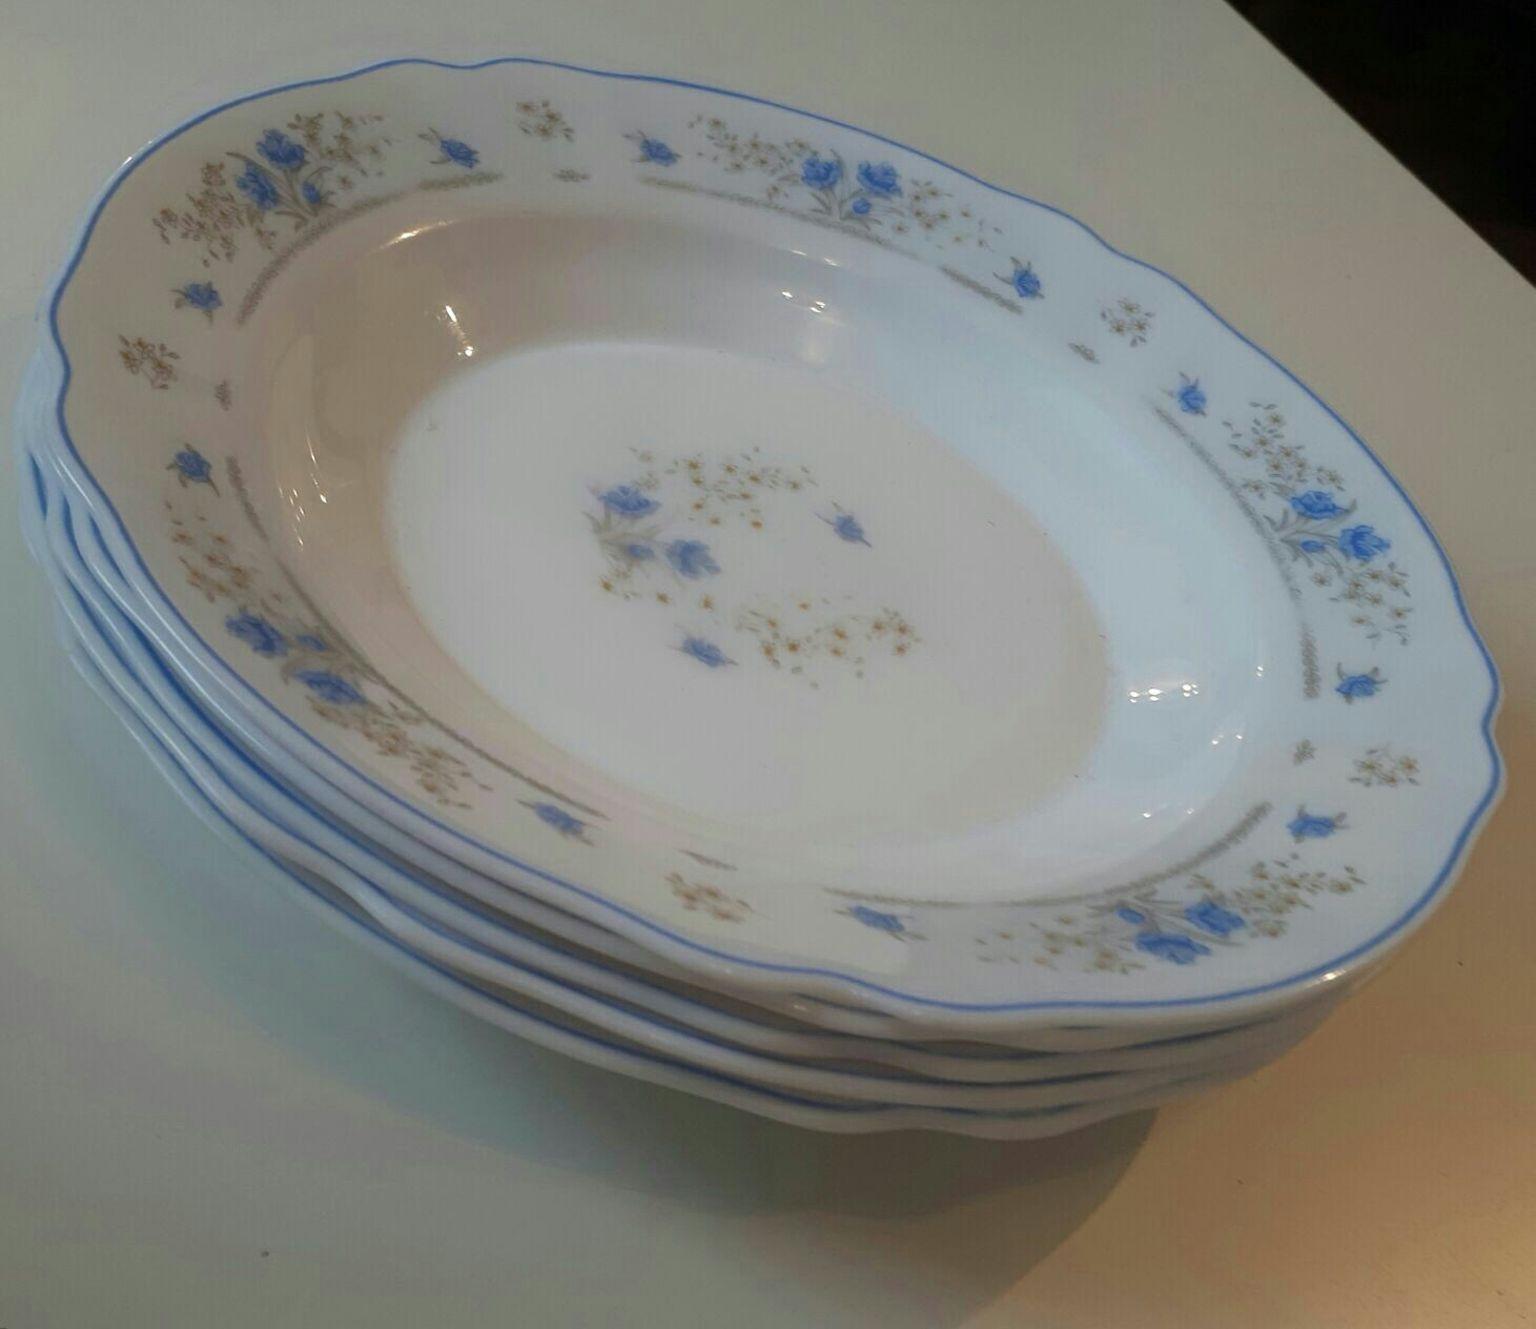 weller vase value of https en shpock com i wbzgrs0qwfowf4ms 2017 09 23t224830 for plates 5 piece 51ccc77e